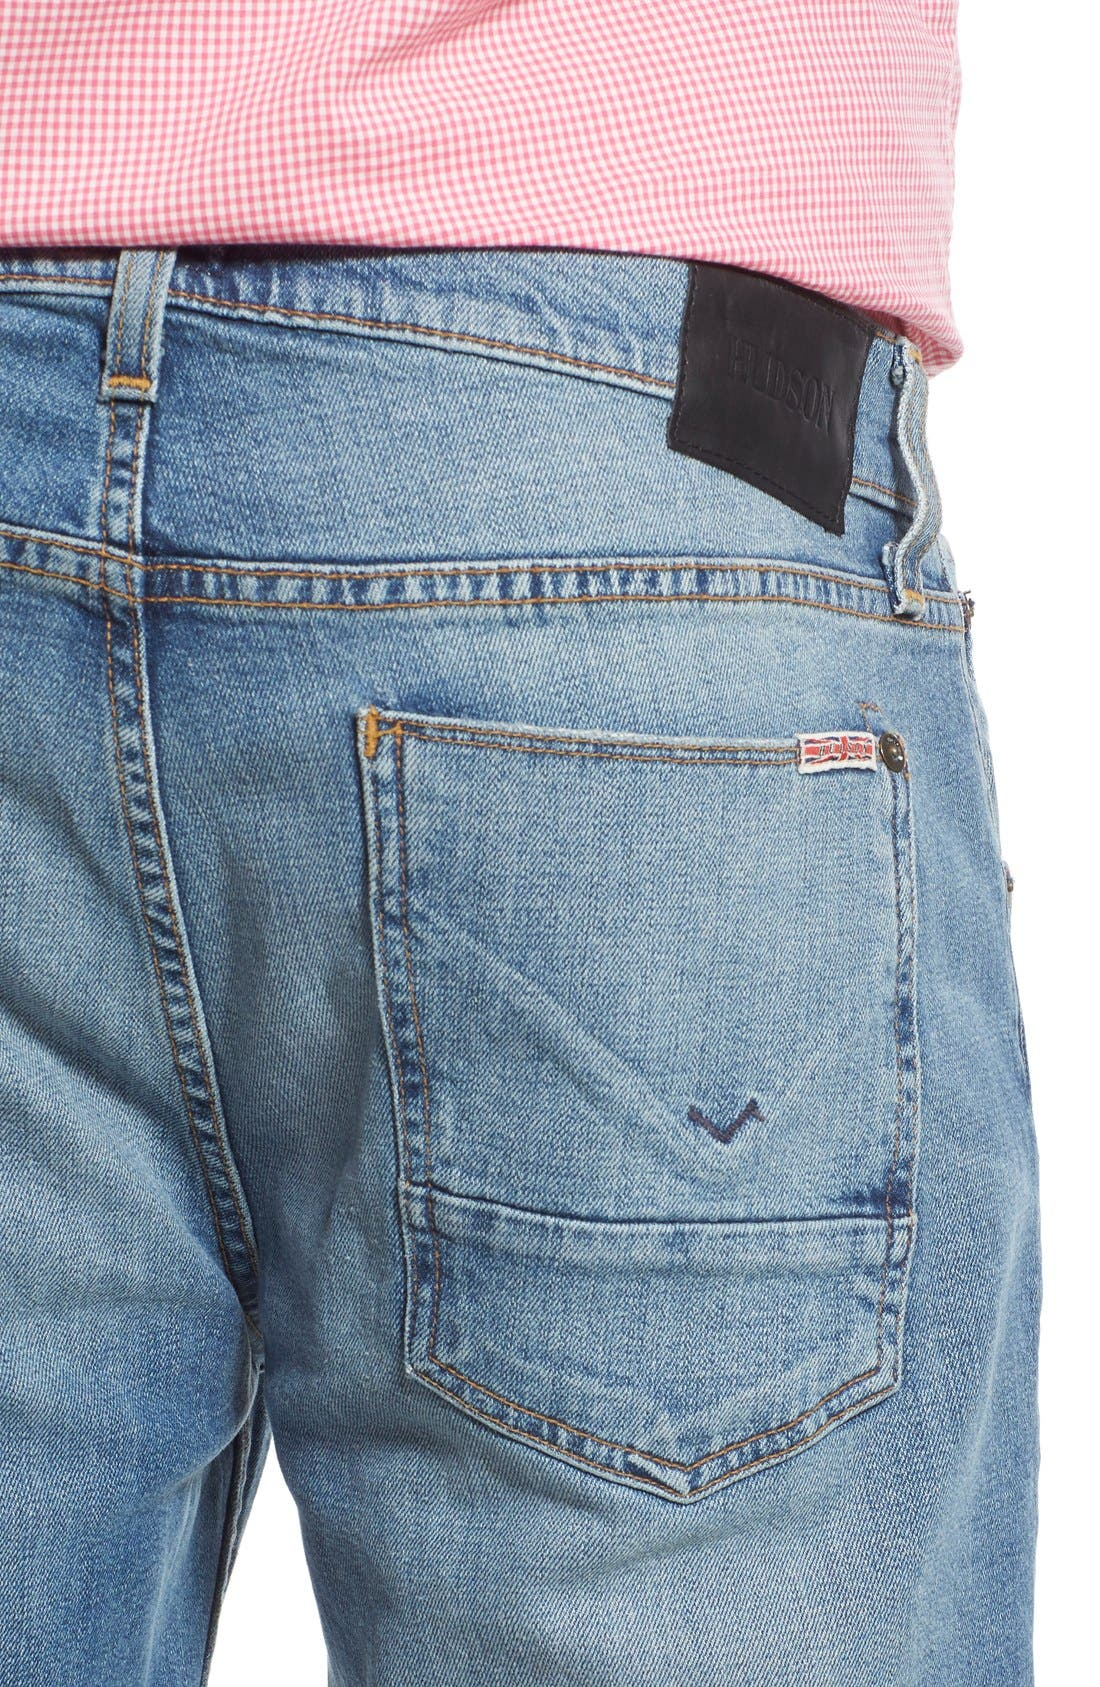 Byron Slim Straight Leg Jeans,                             Alternate thumbnail 5, color,                             Adversary